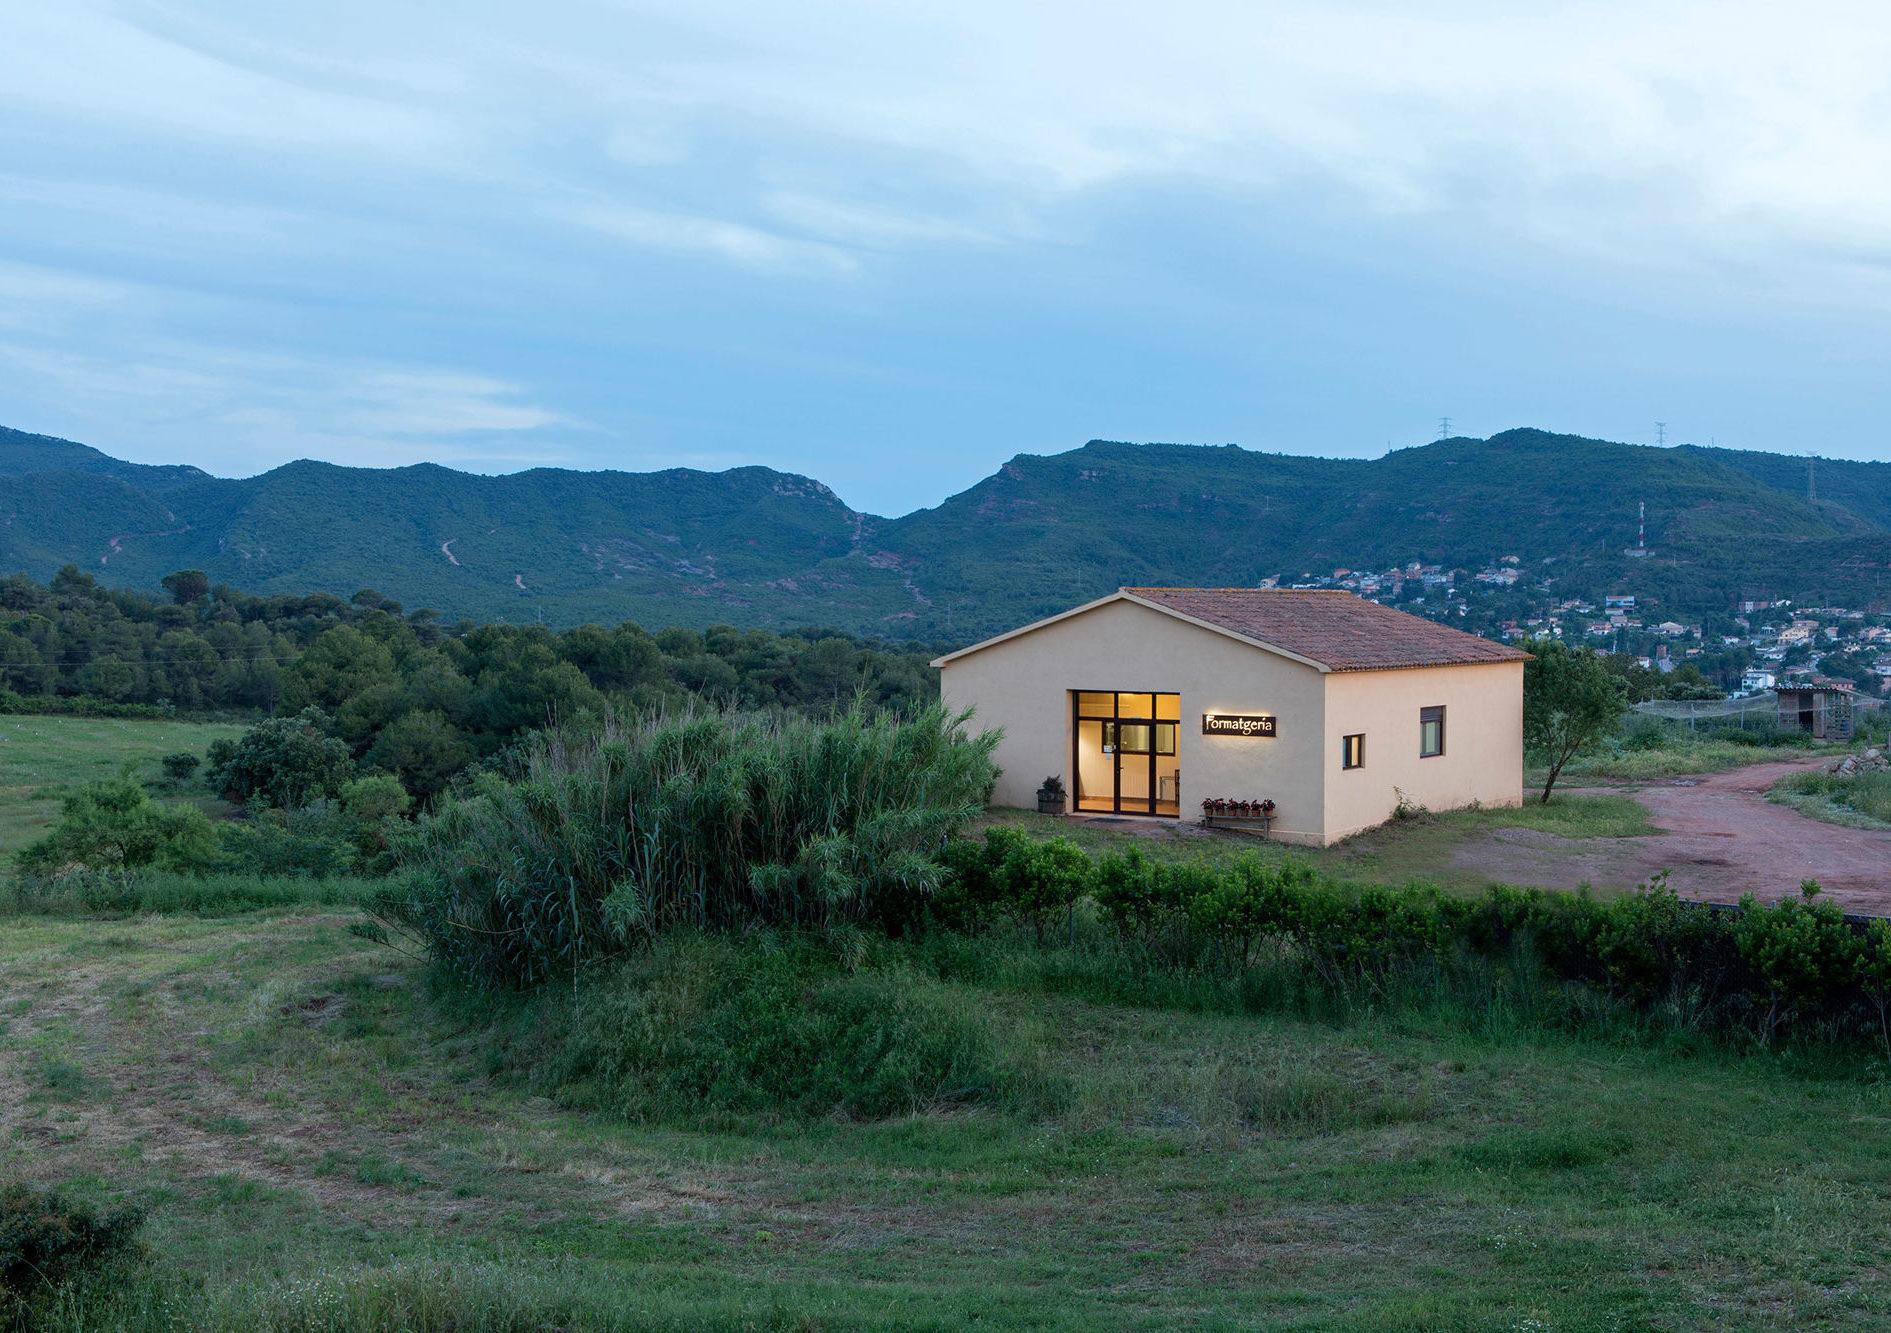 lafrasera e1586959807609 - Where to rest-Sant Llorenç del Munt i l'Obac